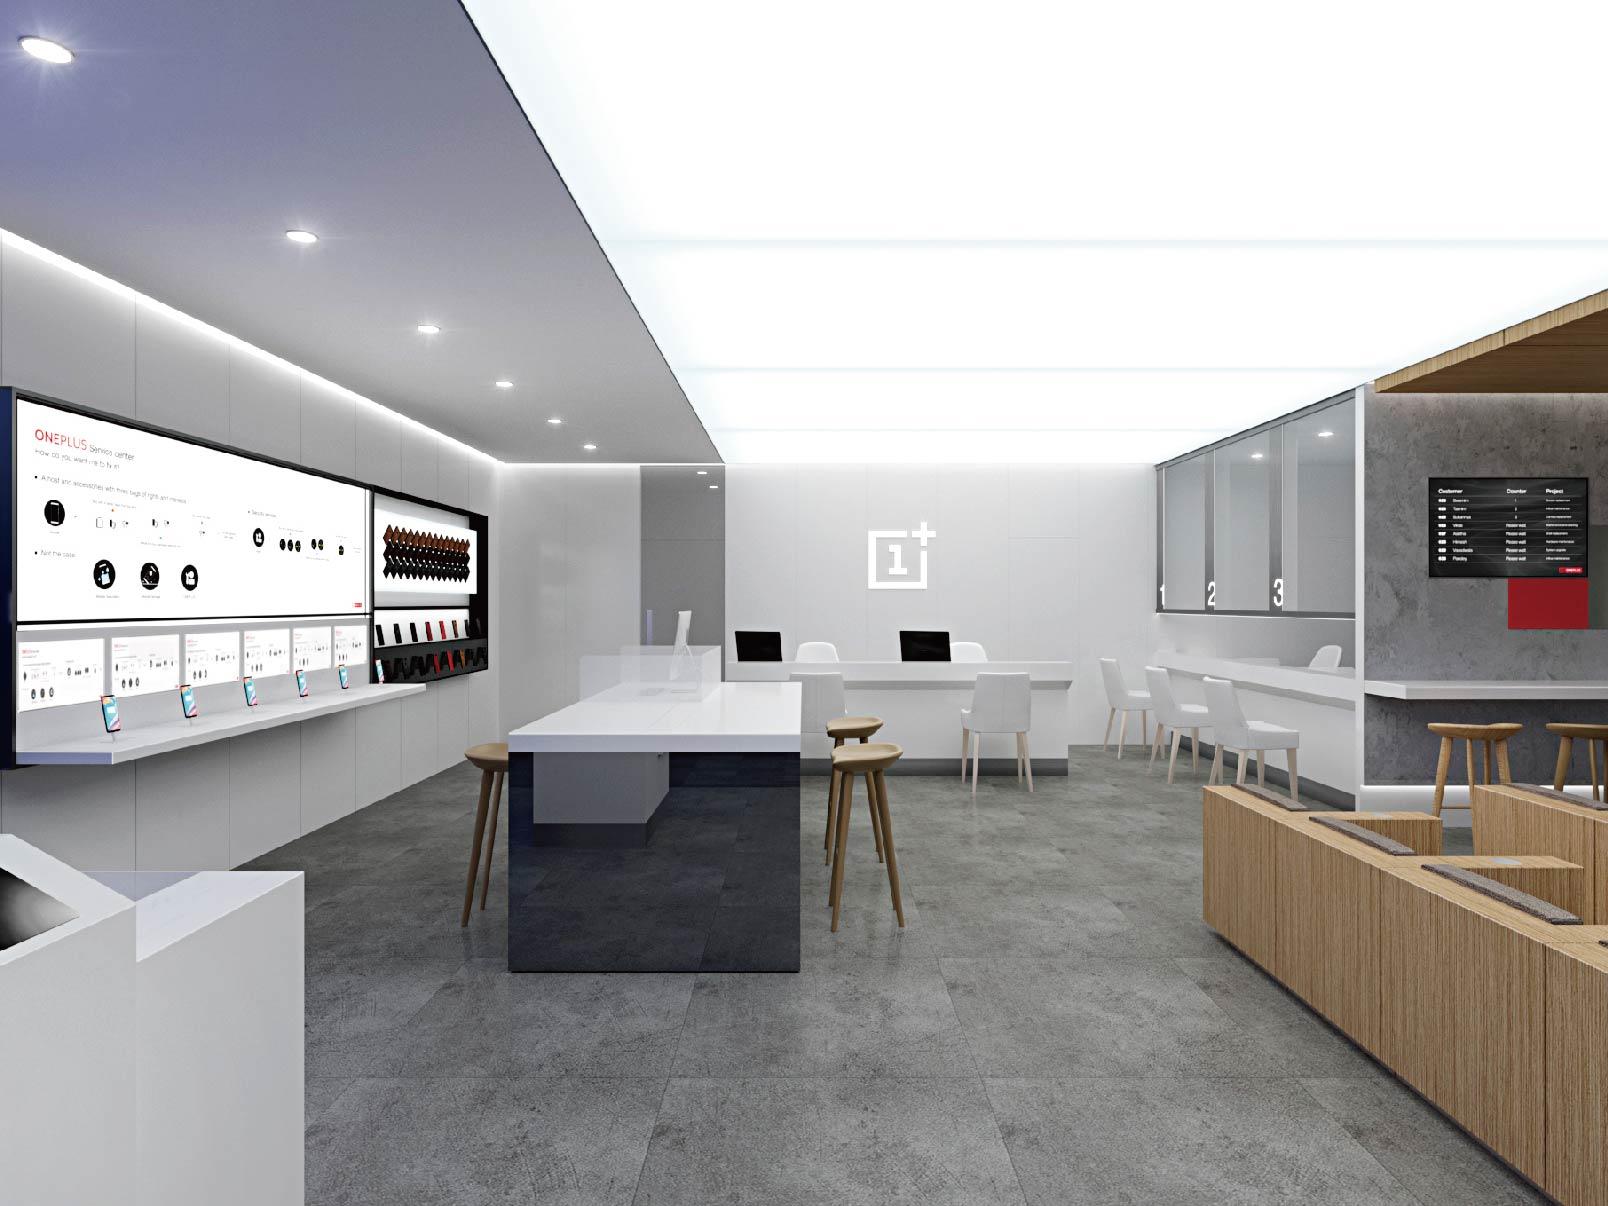 Store Design for OnePlus Customer Service Centre